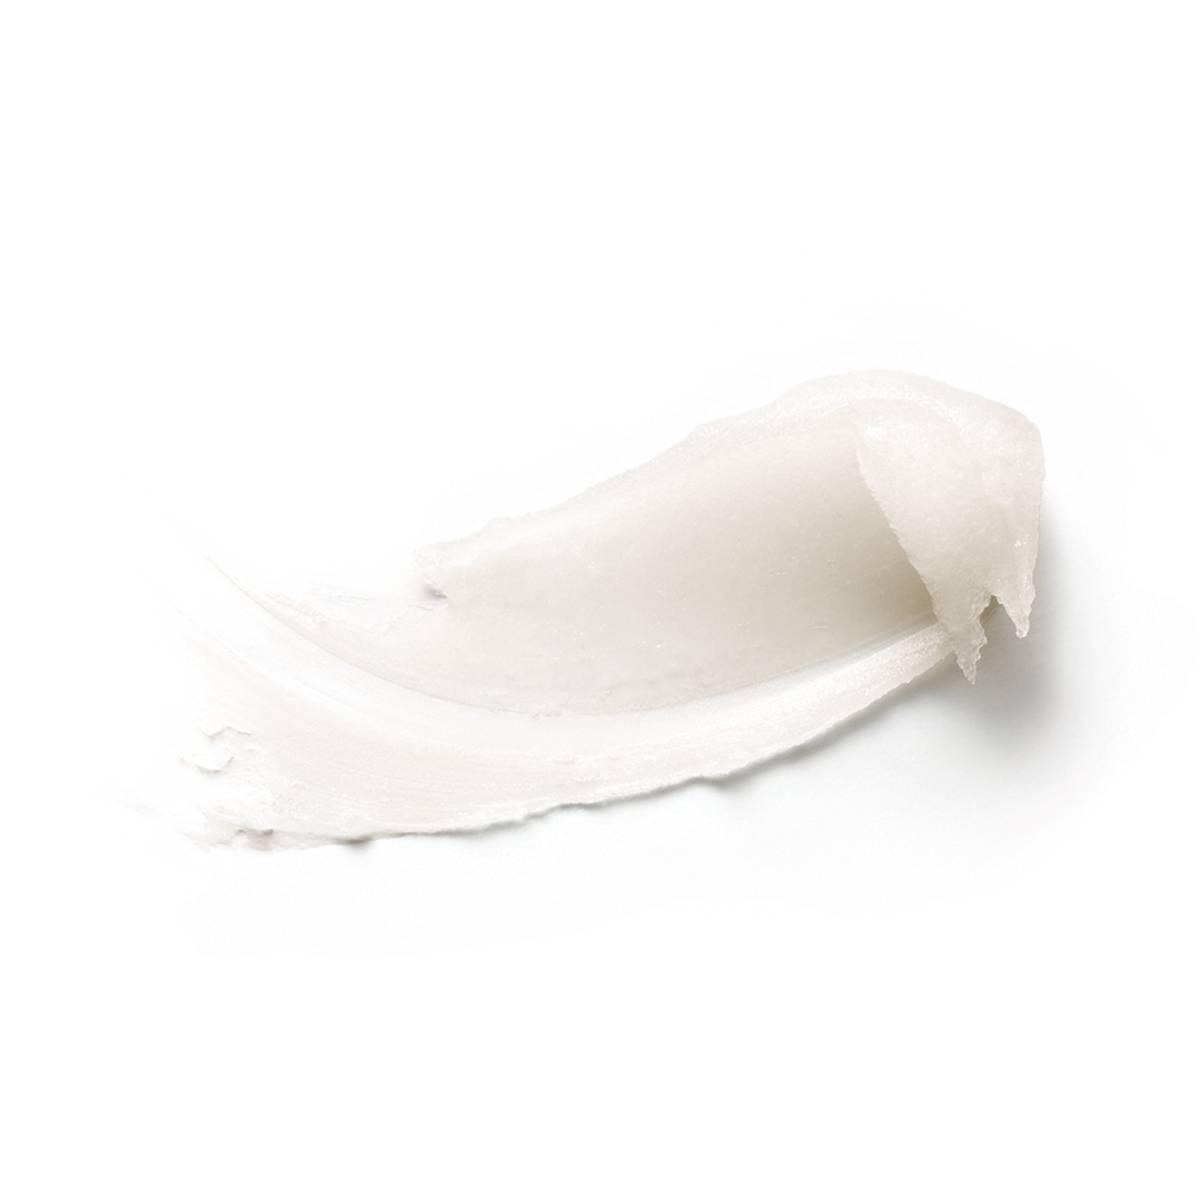 La Roche Posay ProduktSide Beskadiget Cicaplast Læbepomade Tekstur